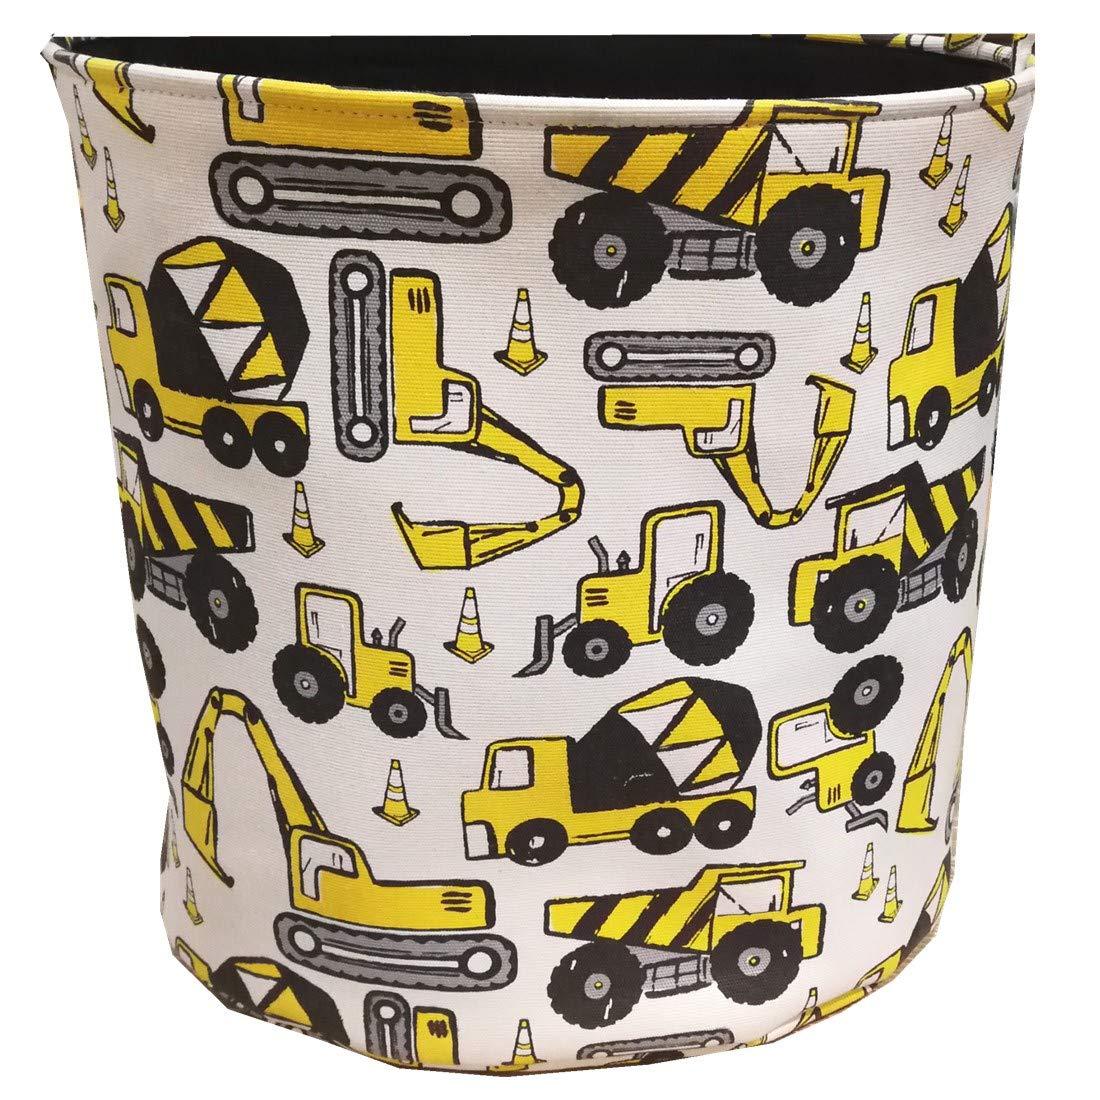 Storage Baskets Boys Kids, Cotton Cartoon Cute Toy Storage Bins Kids Laundry Basket Nursery Hamper with Handle Toy Box/Toy Organizer Medium Size (Engineering Car)